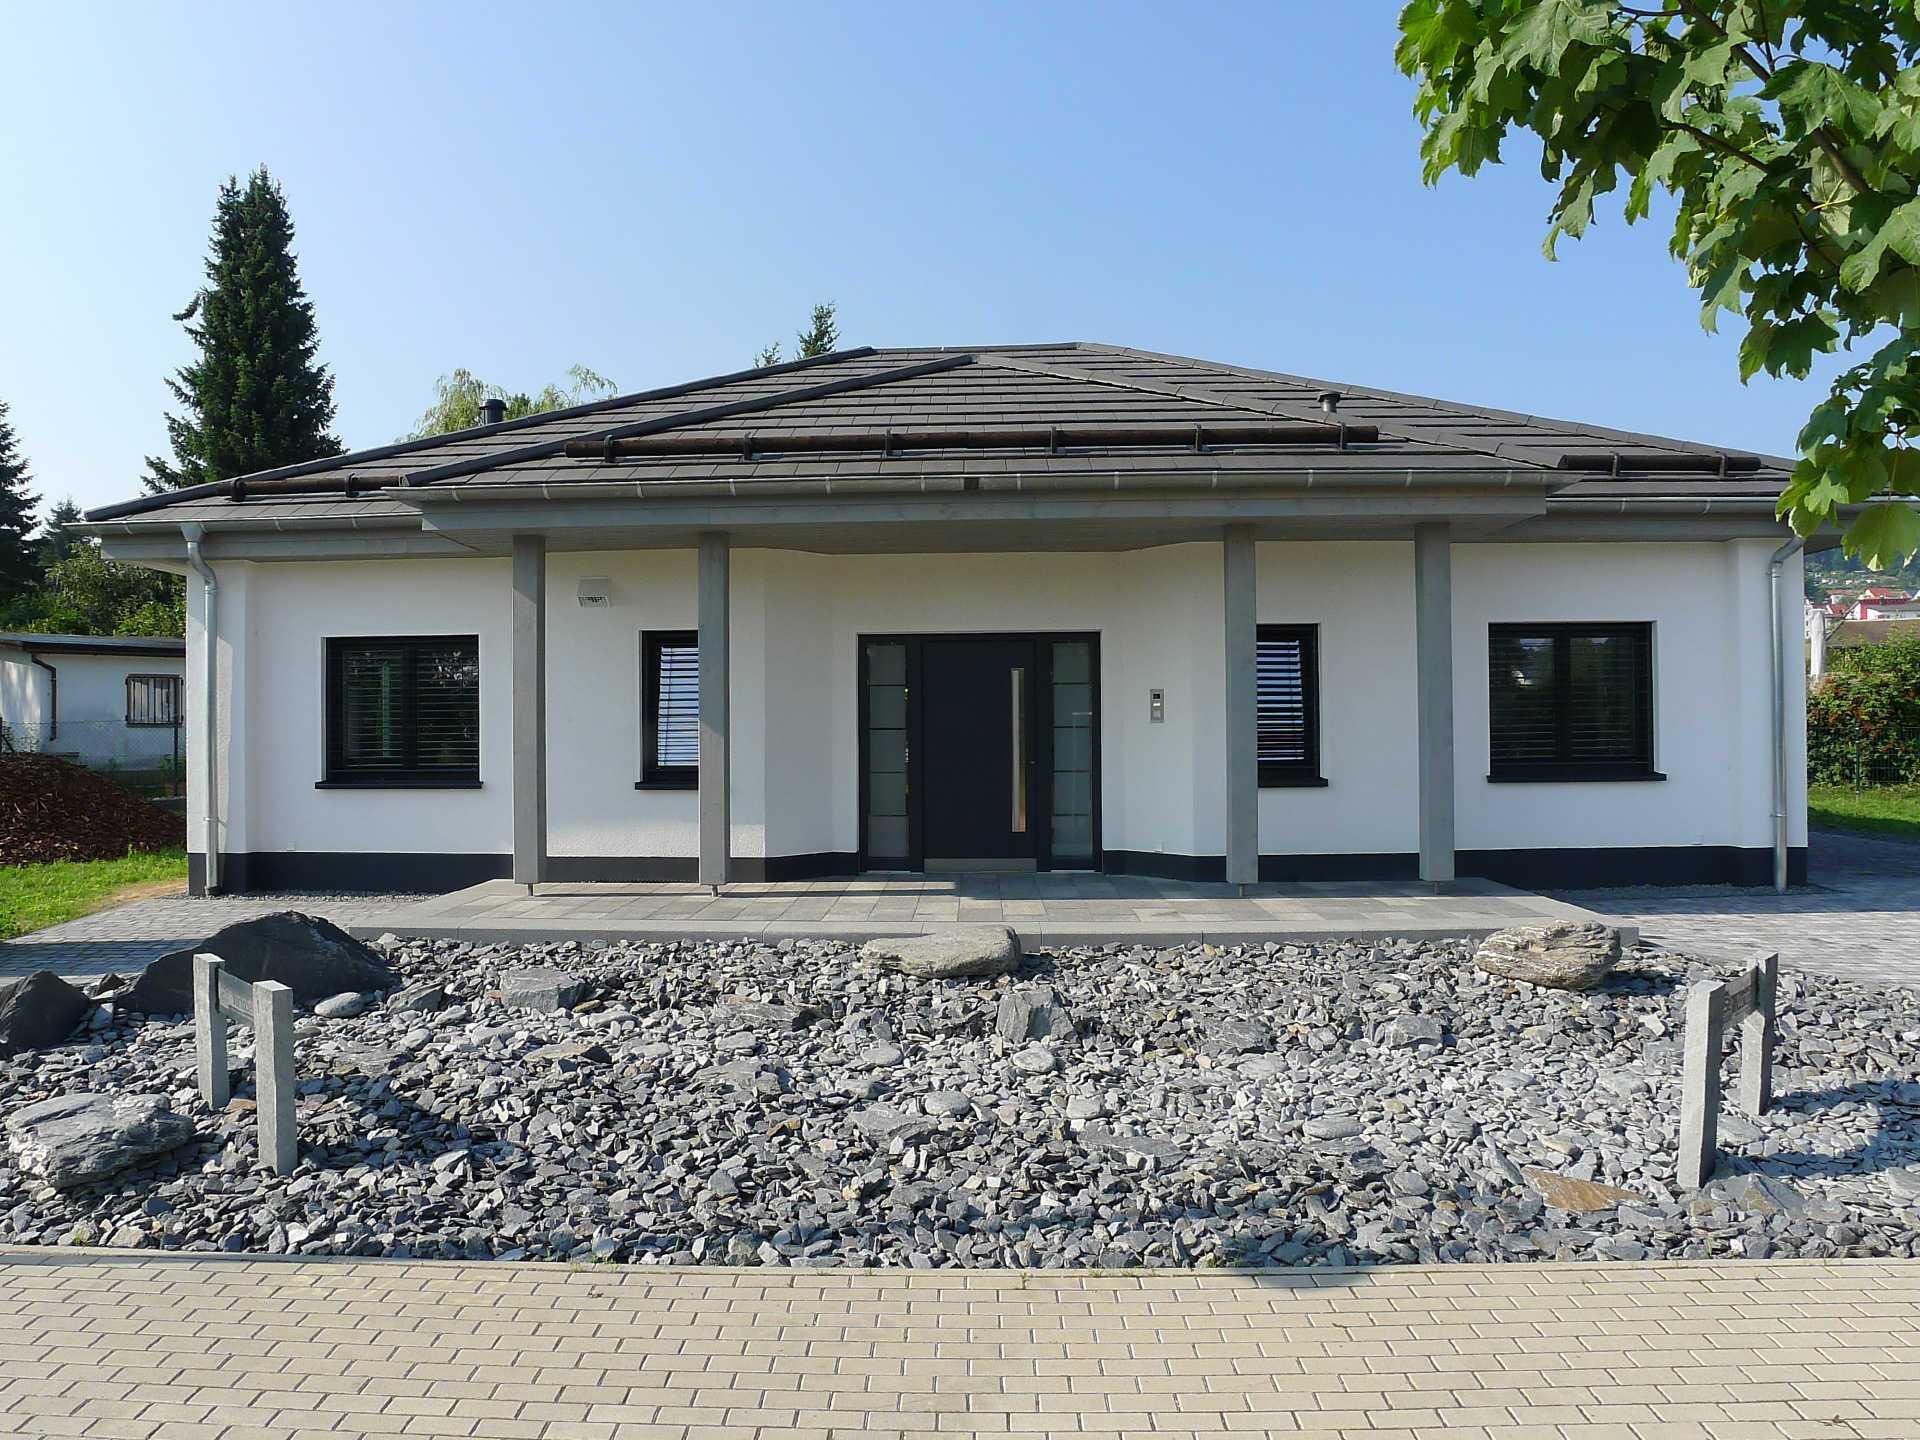 HSE Musterhaus Ilmenau